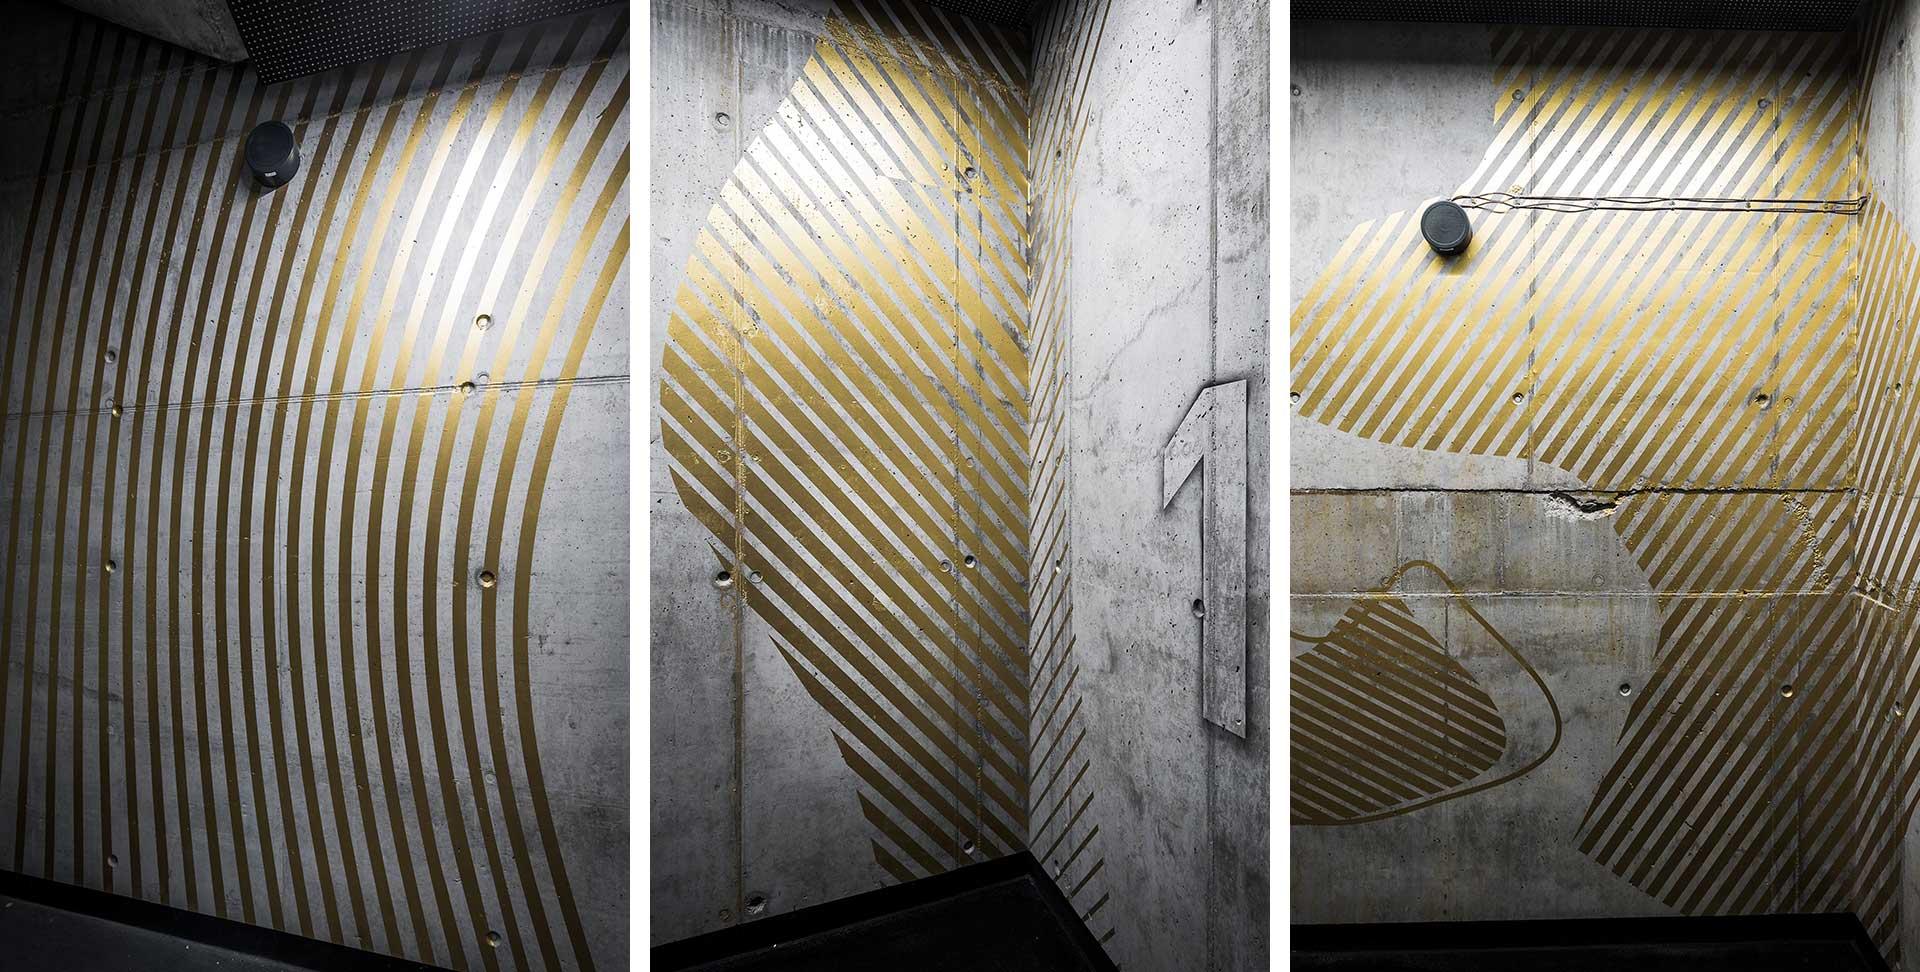 Hala Koszyki室内环境图形设计©kolektyf